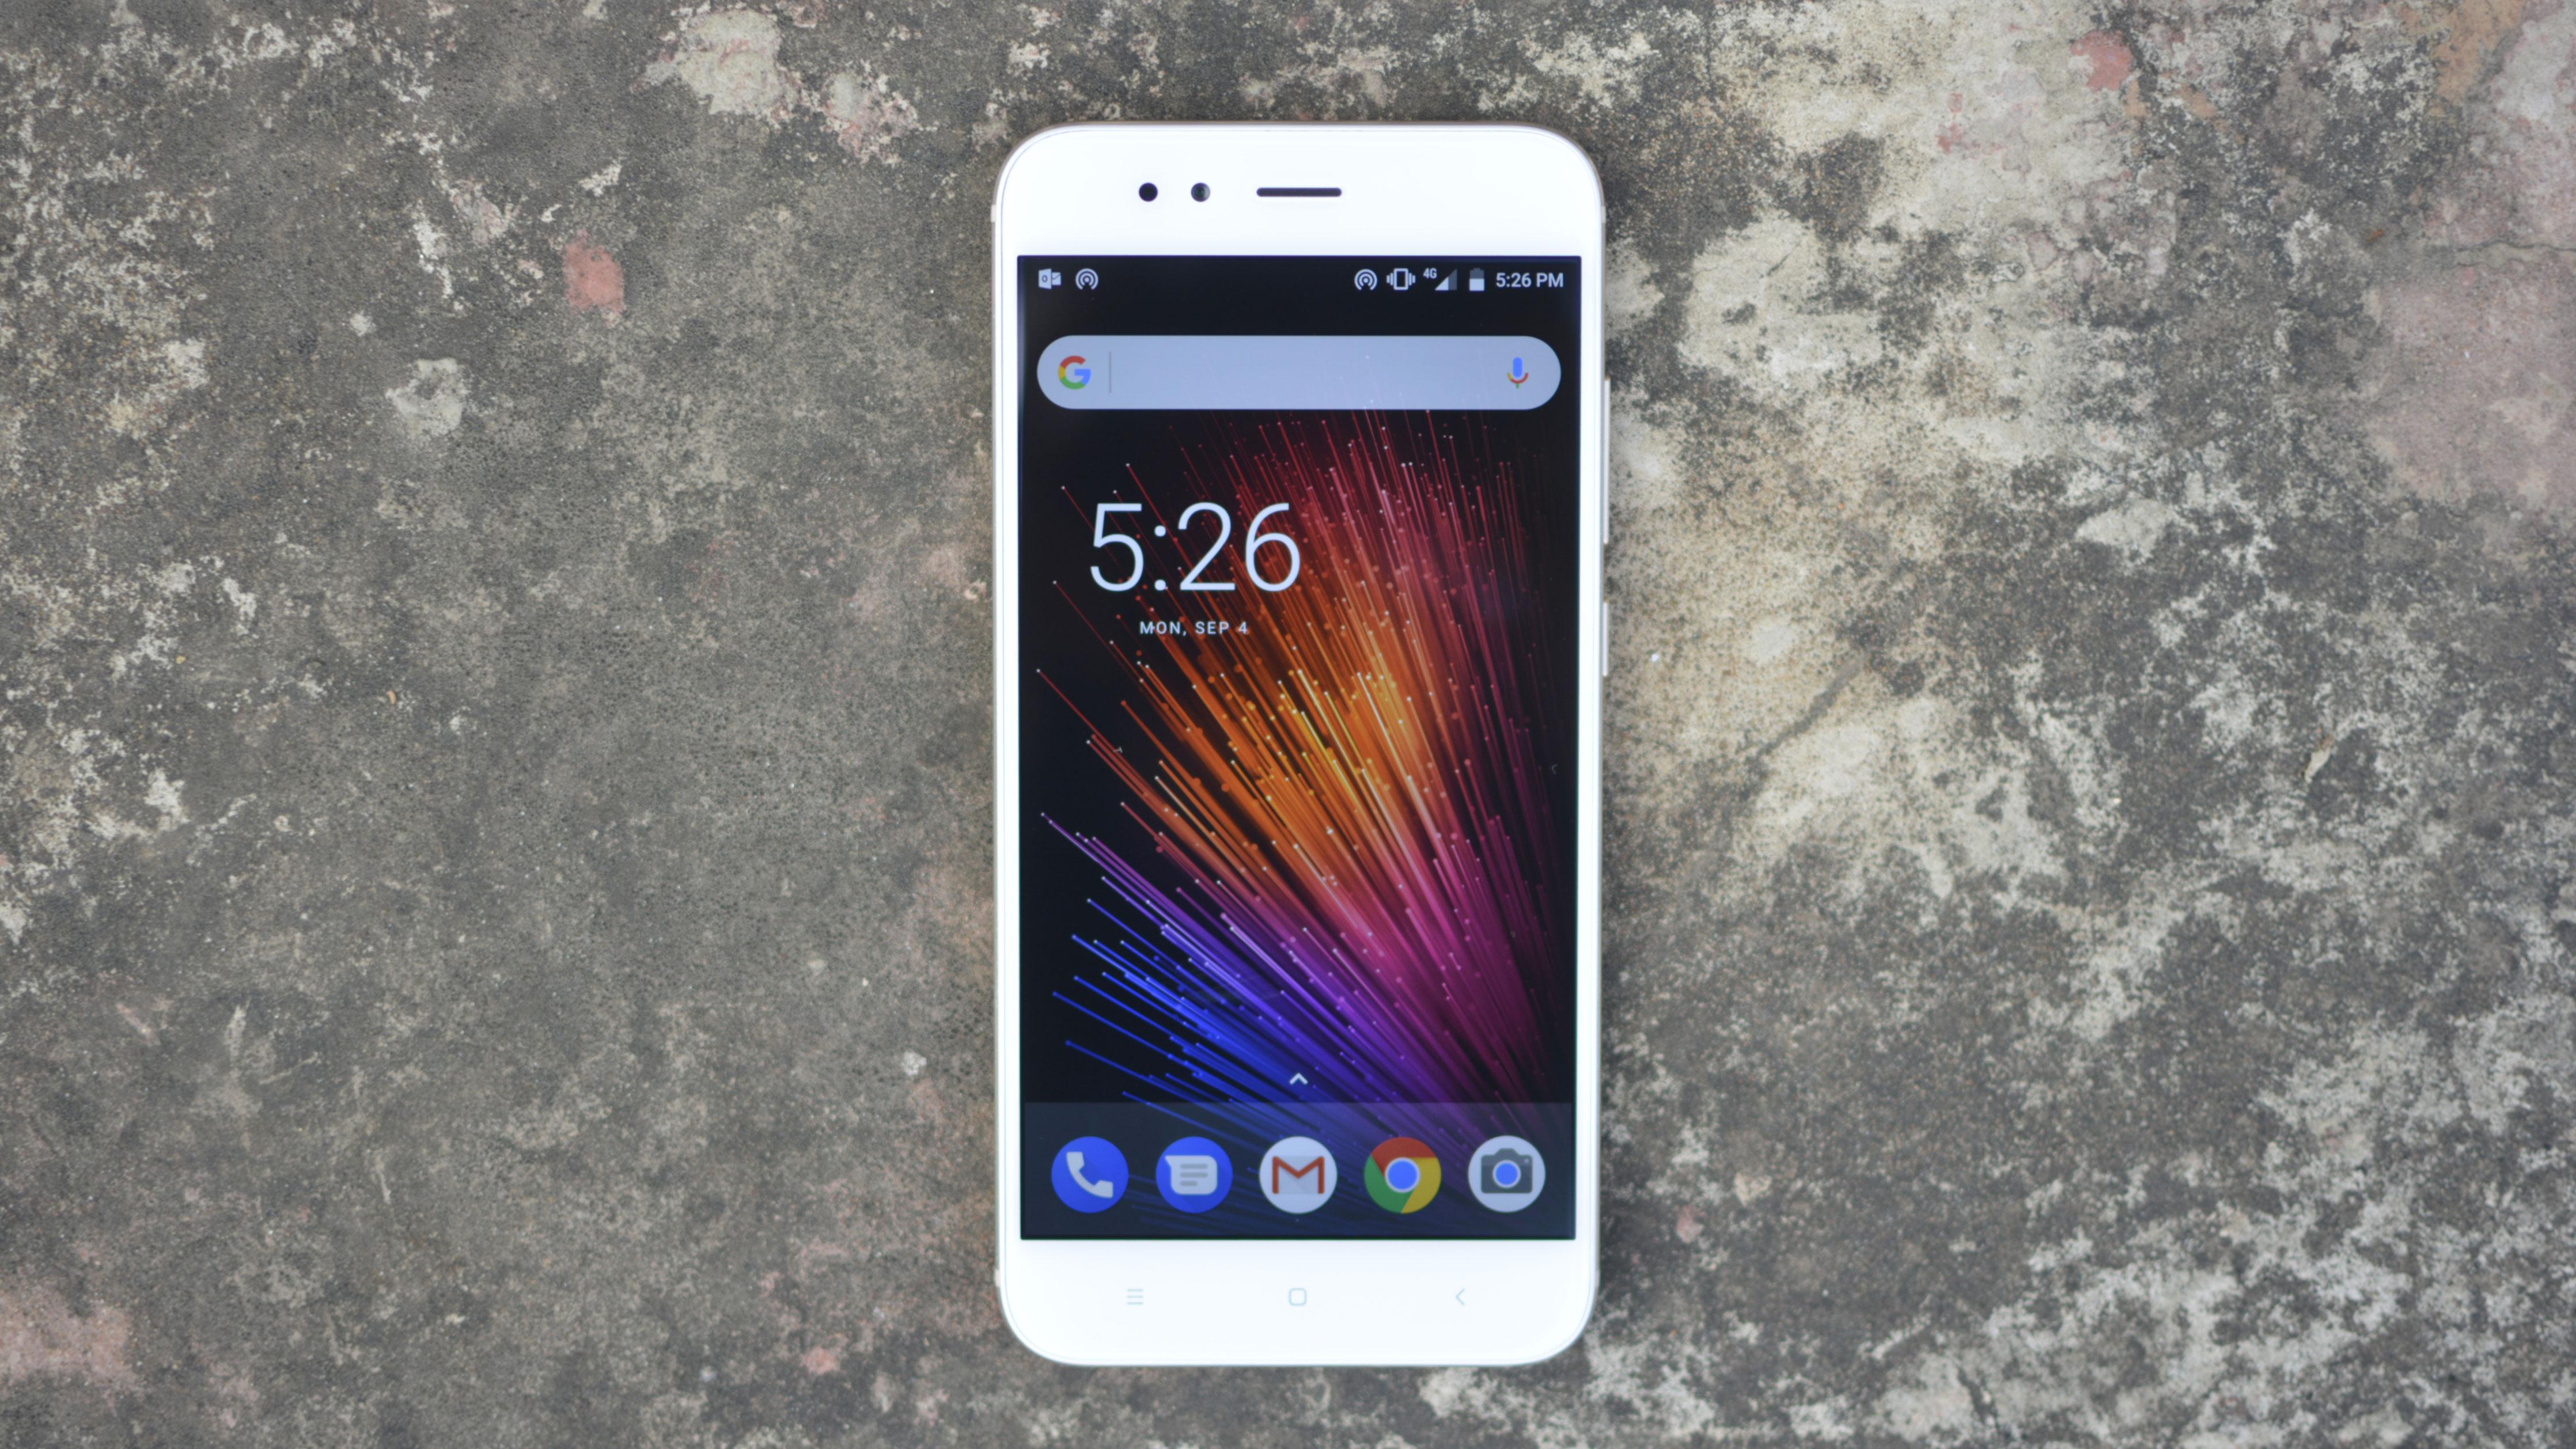 Xiaomi Mi A1 Review Techradar Bestseller Redmi 4x Prime Ram 3gb Internal 32gb